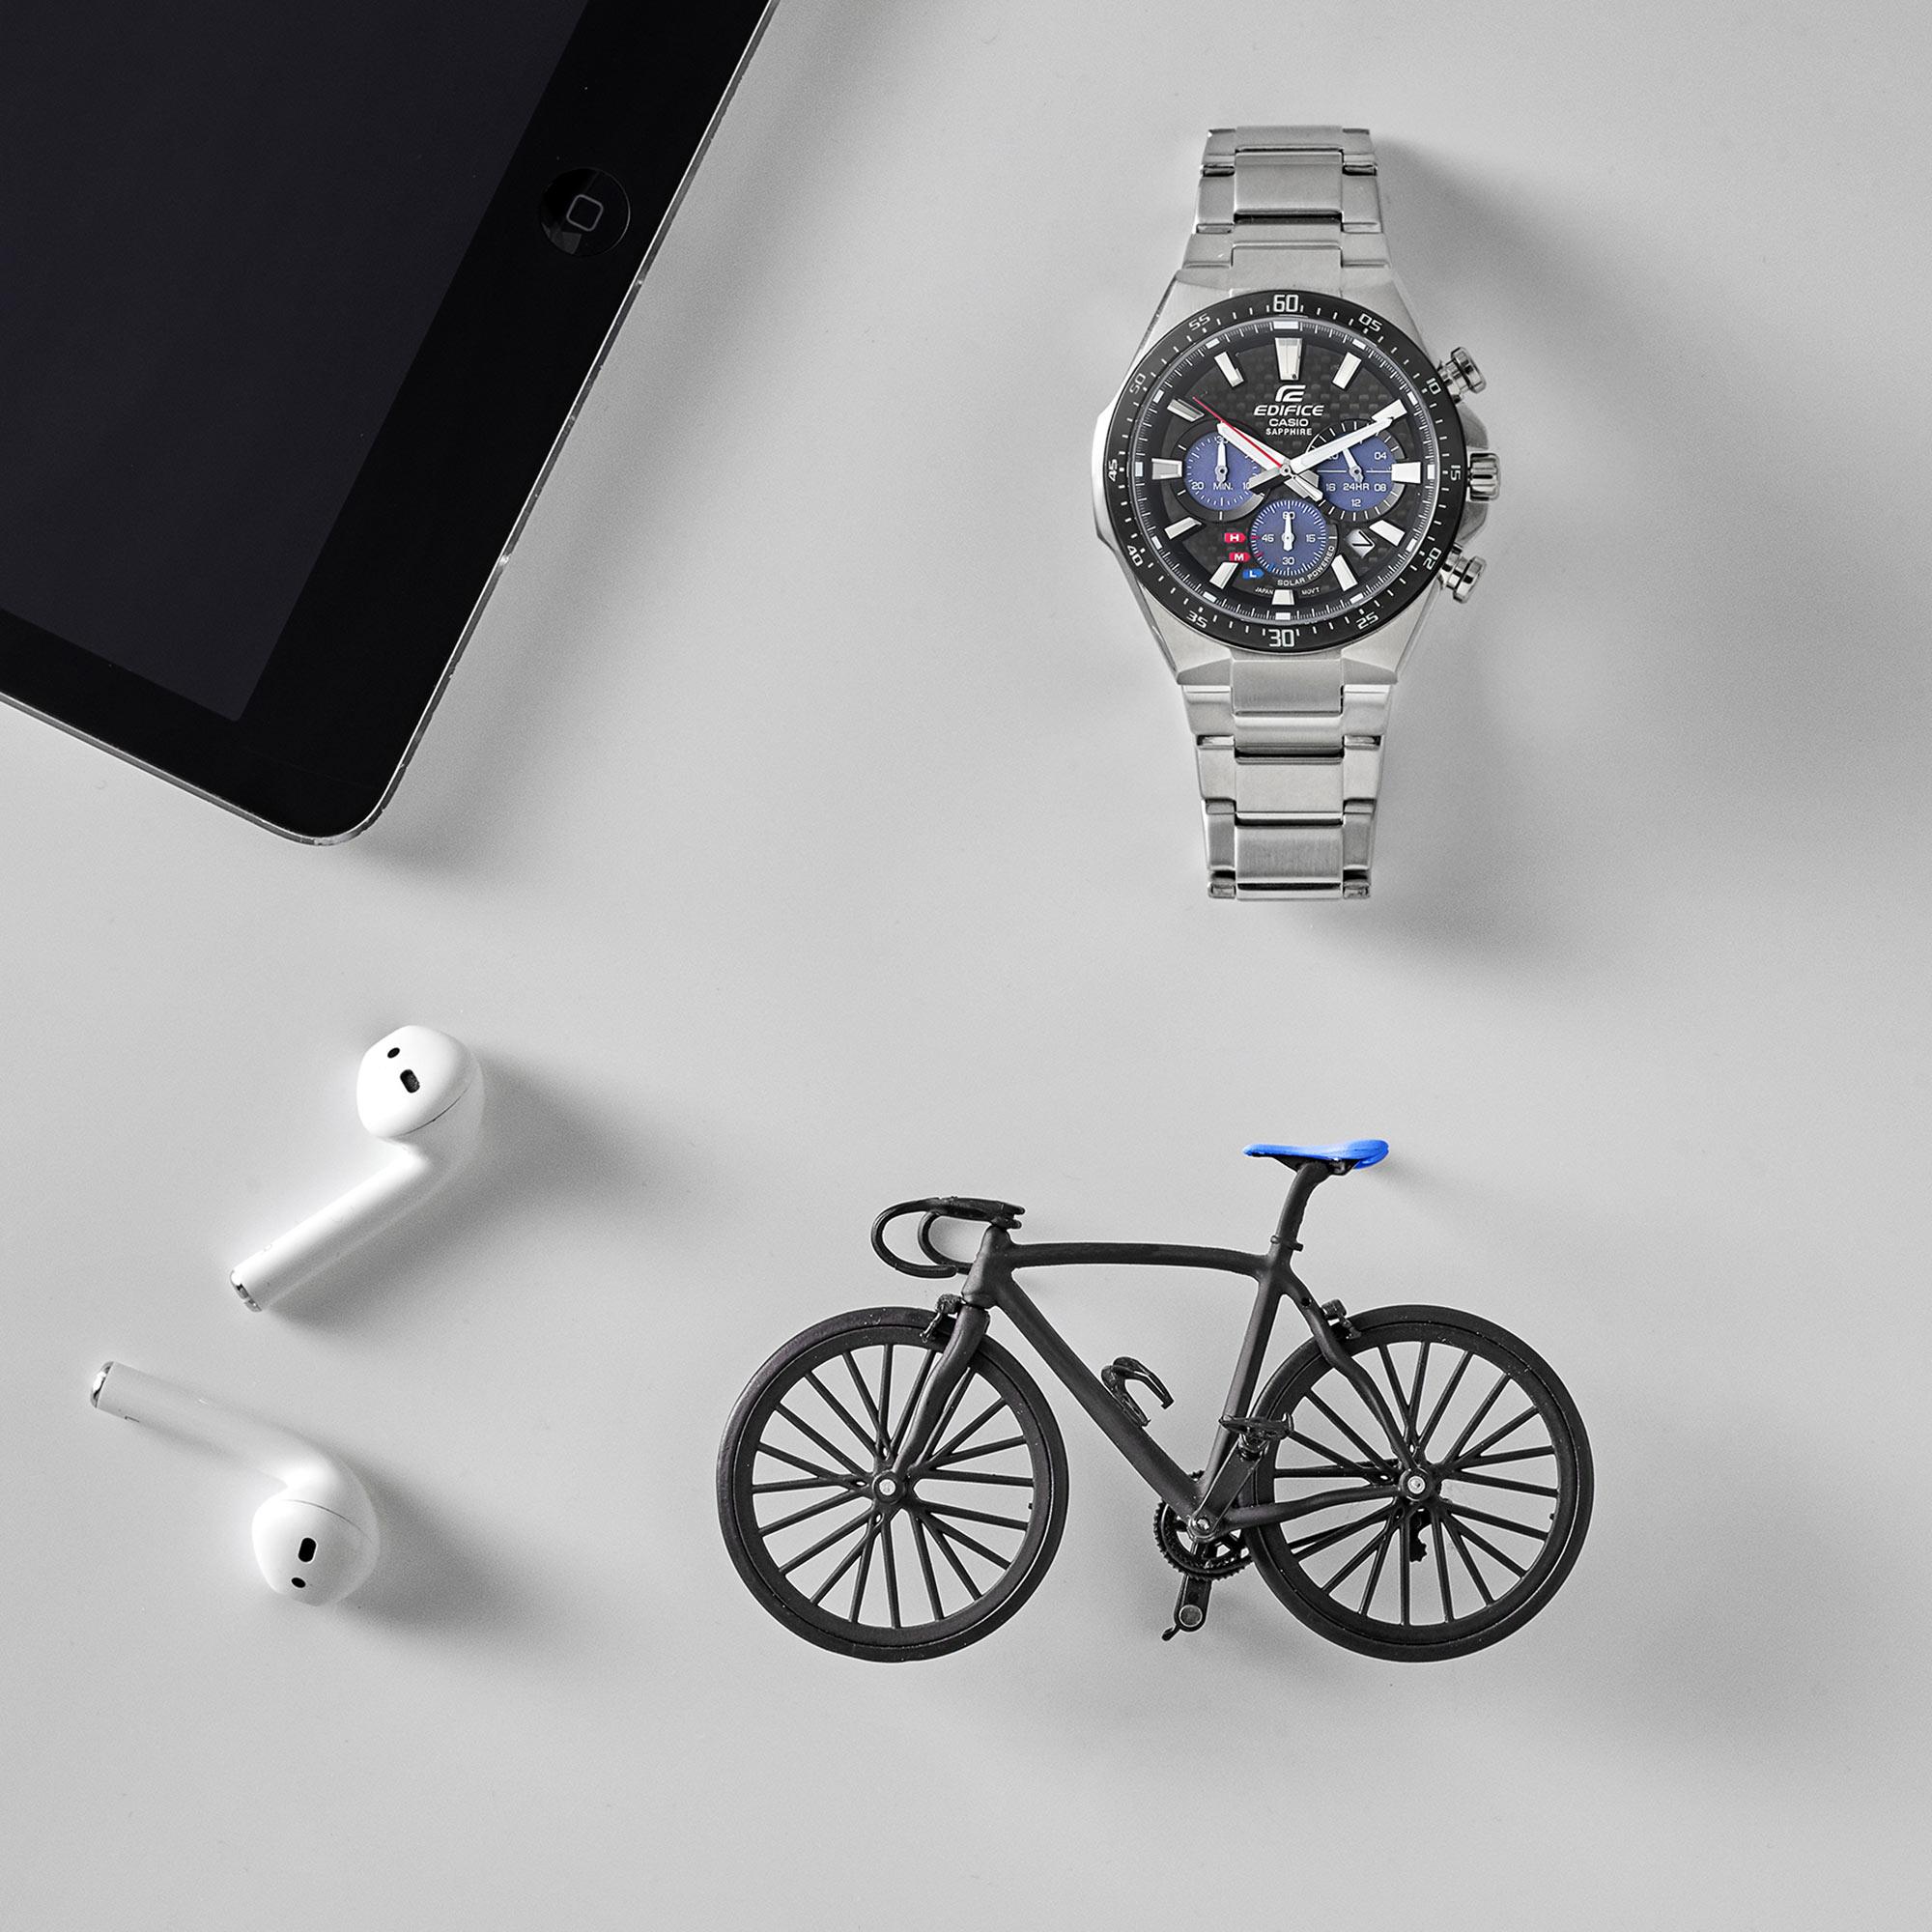 Man Ipad Bike Headphones Airpods Bicycle Still Life Shot for Casio by Fotografando